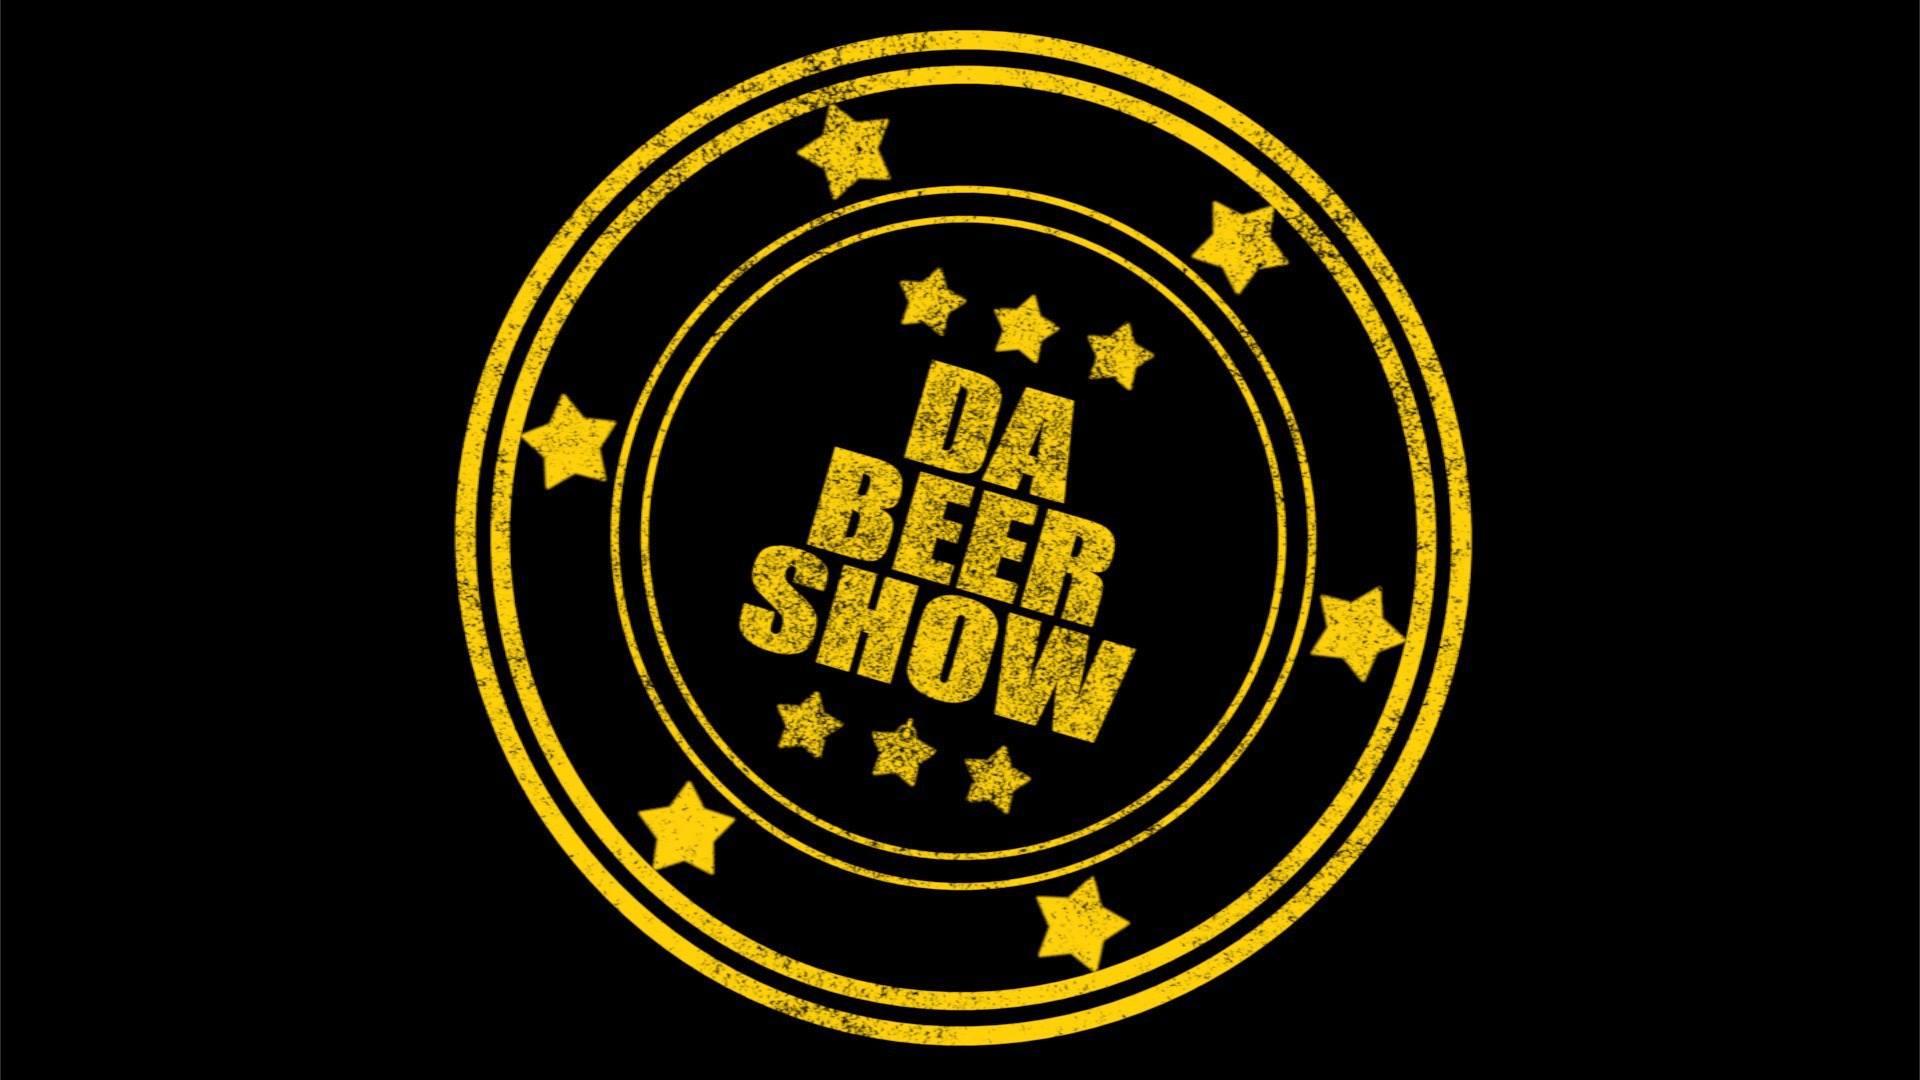 Da Beer Show